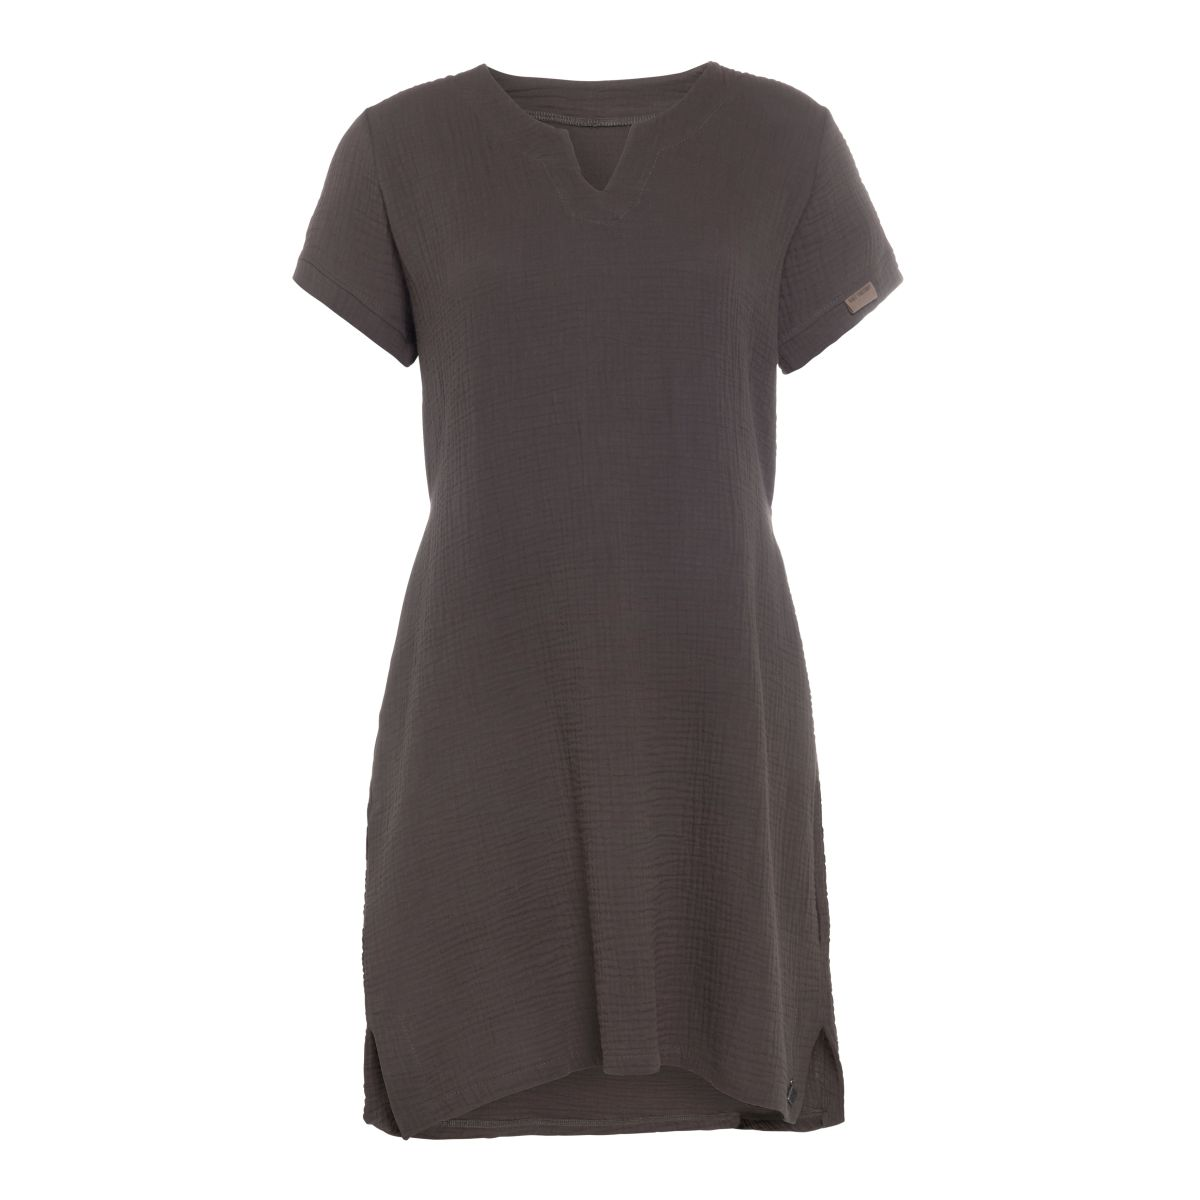 knit factory kf15012001049 indy jurk antraciet s 1